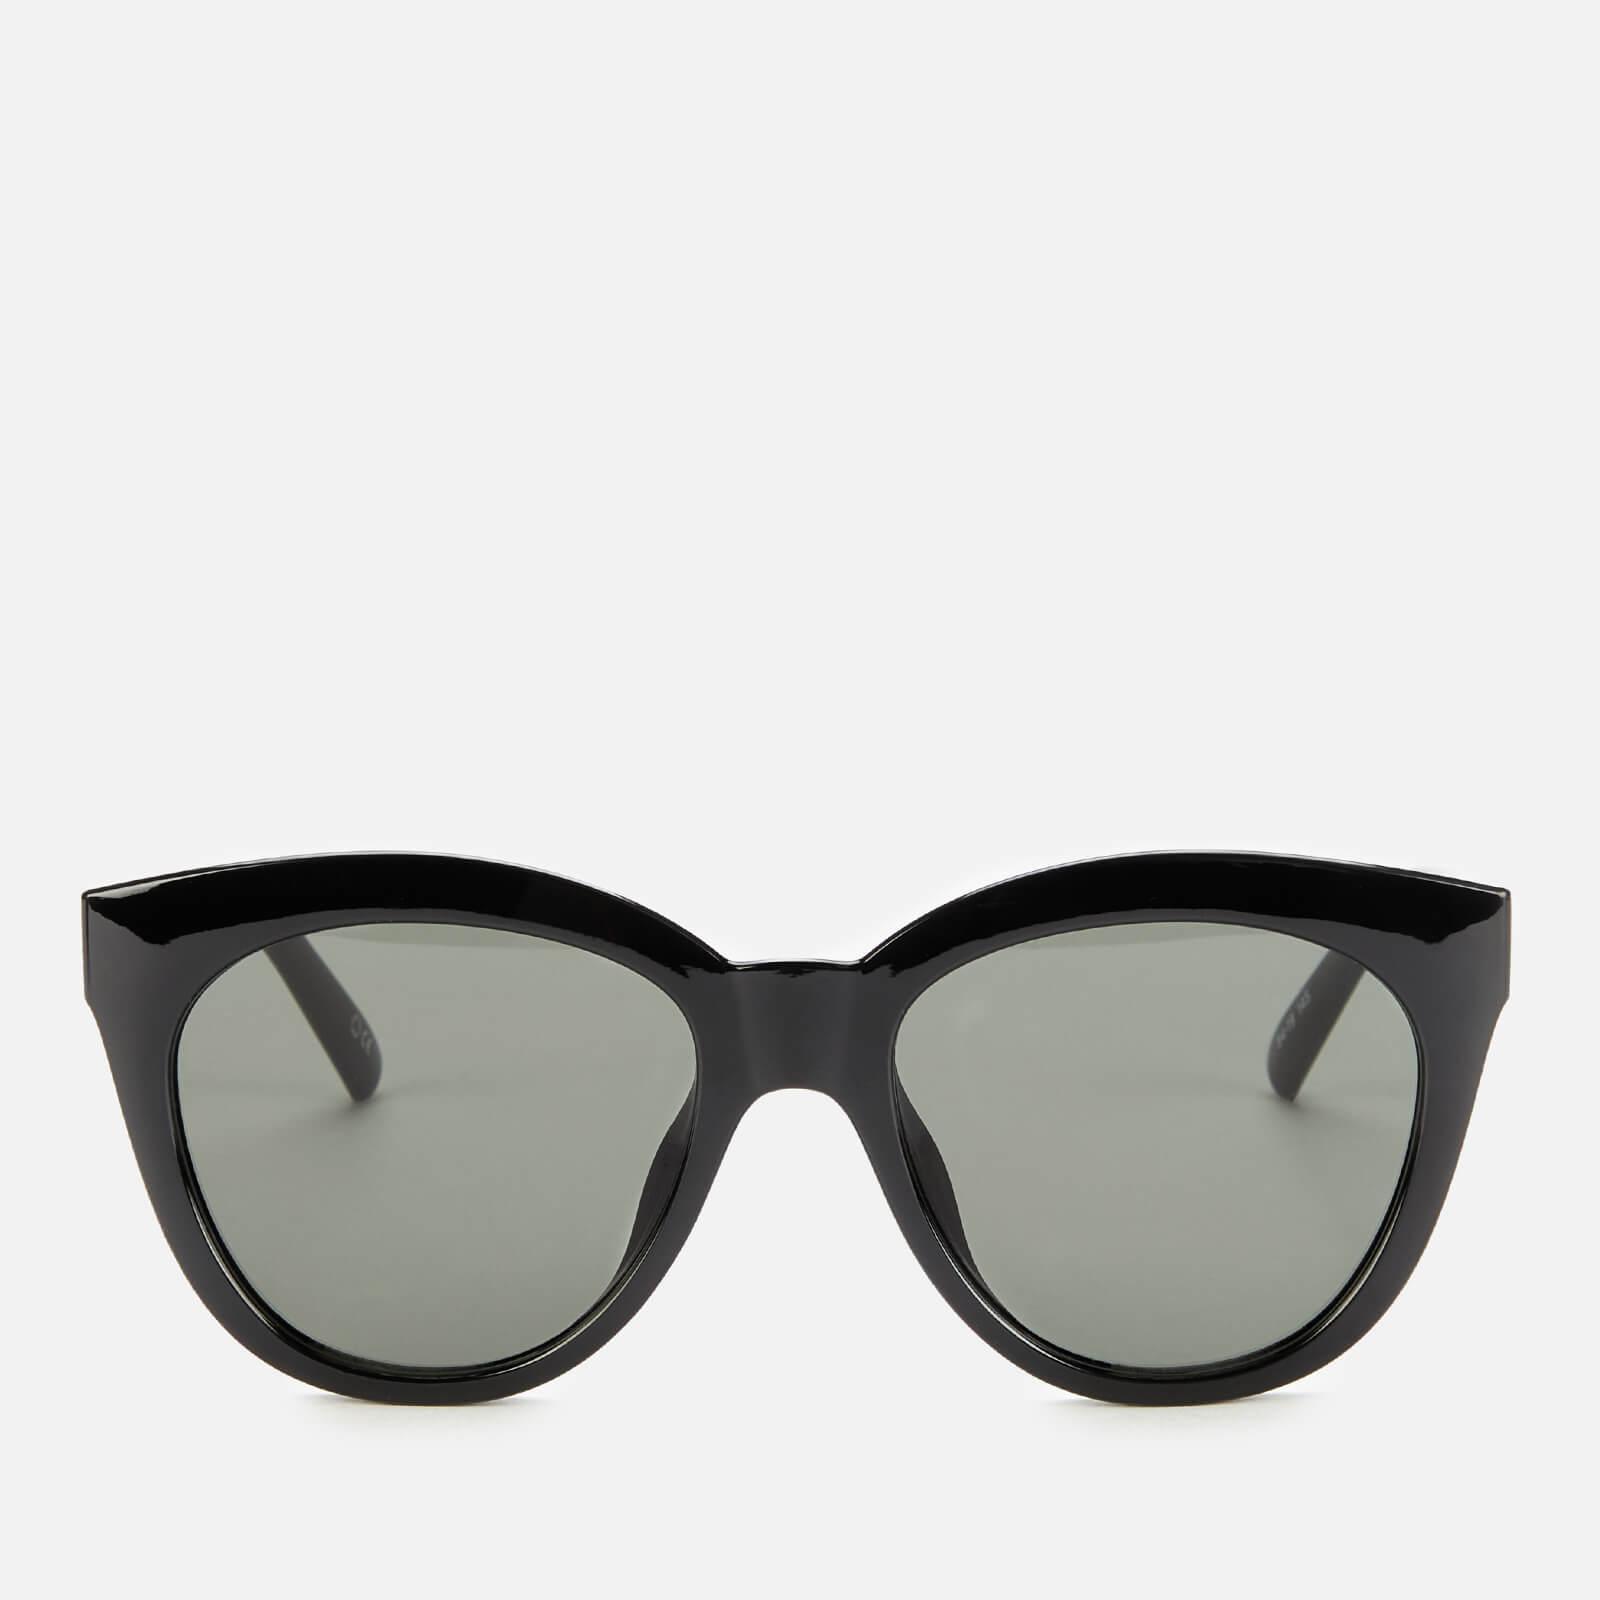 Le Specs Women's Resumption Round Sunglasses - Black